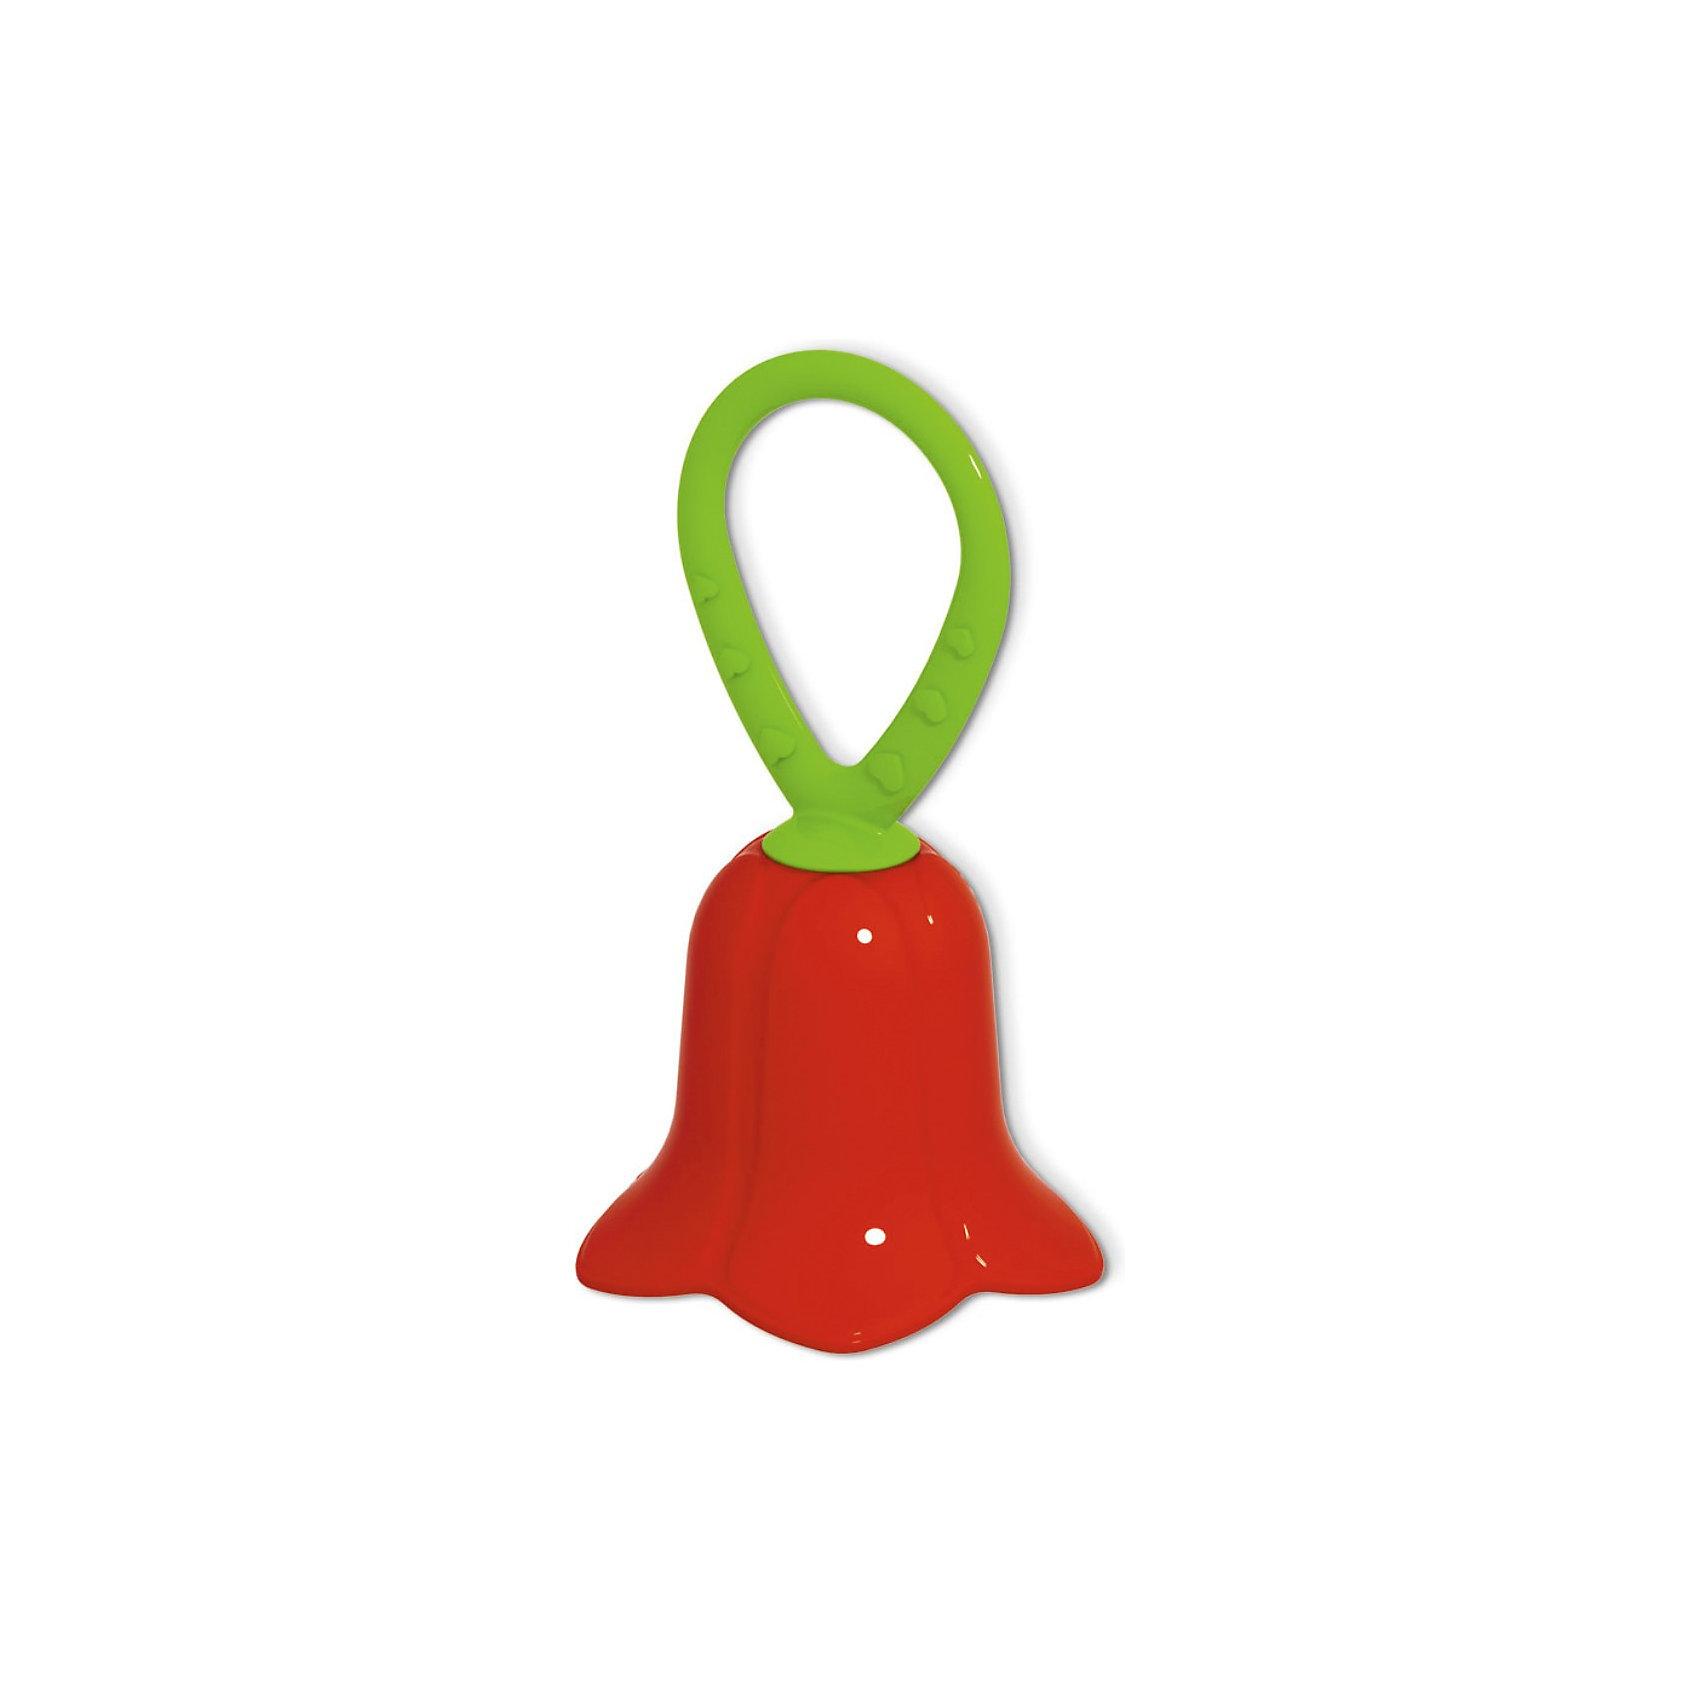 Стеллар Погремушка Колокольчик, Стеллар музыкальные игрушки стеллар дудочка